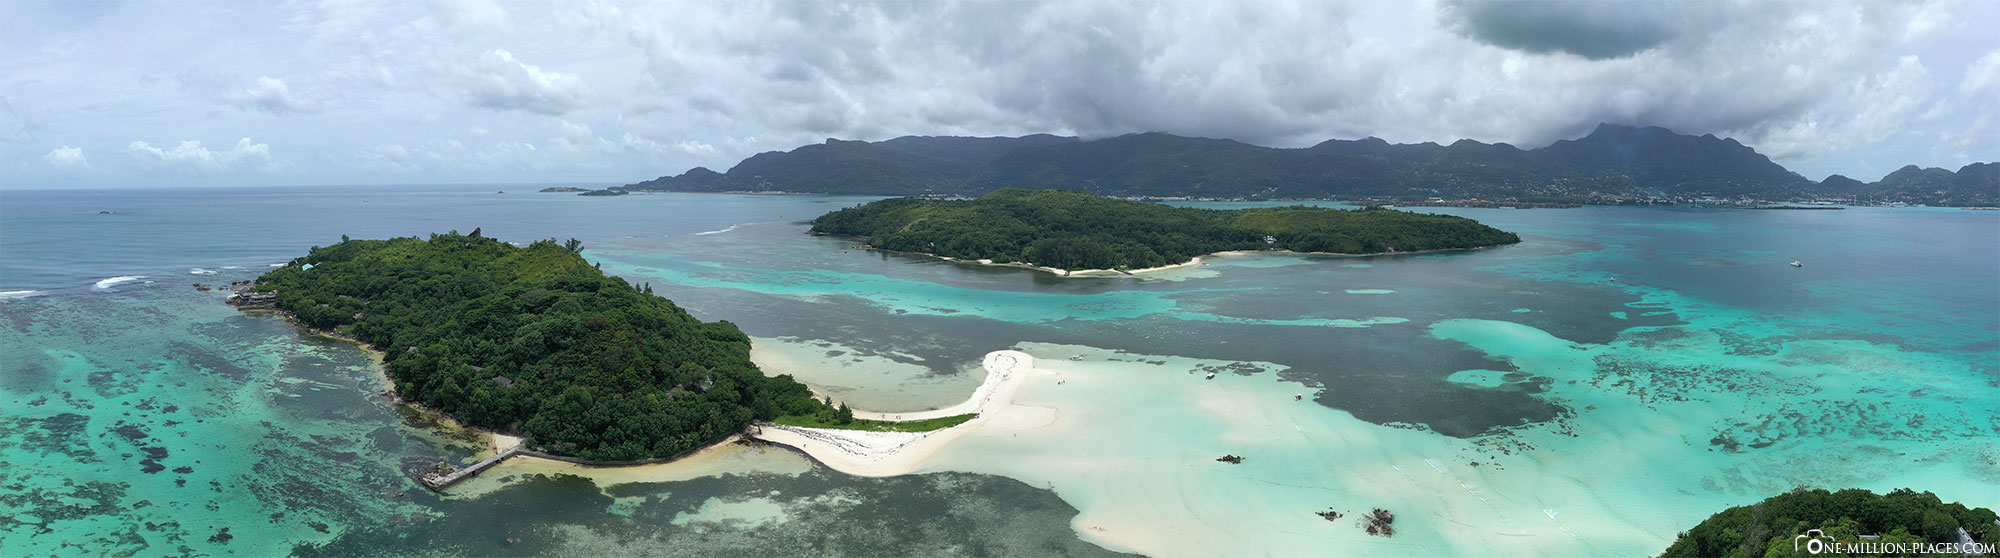 Sainte Anne Marine National Park , Mahé, Seychellen, Drohnenaufnahme, Tour, Reisebericht